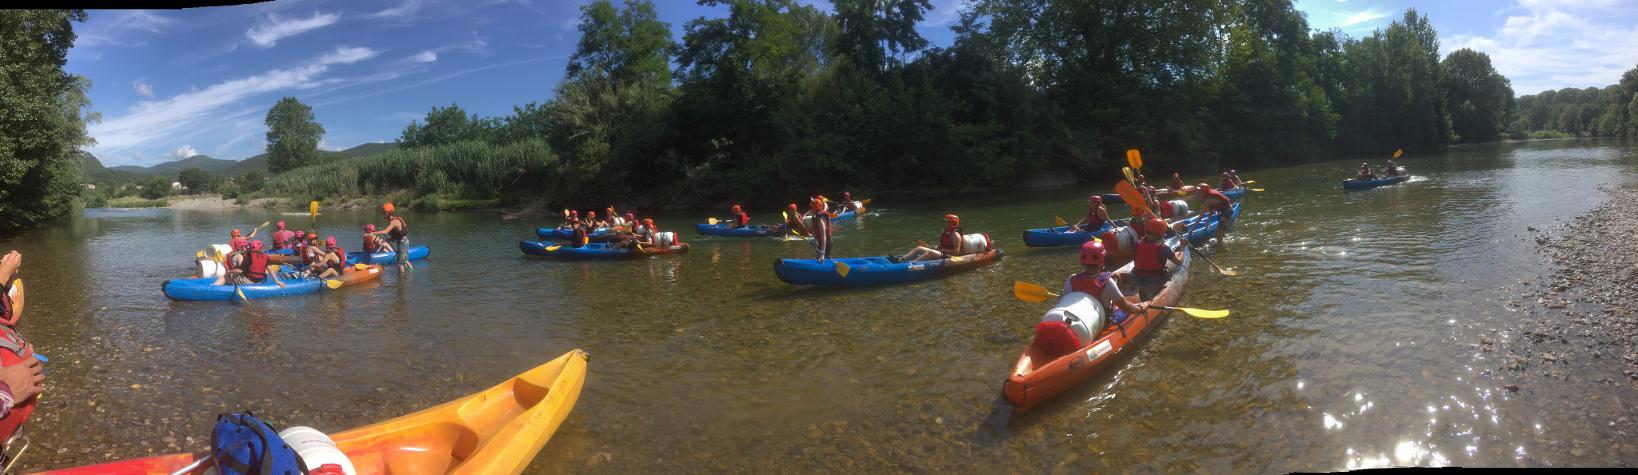 BanniereSite Kayak